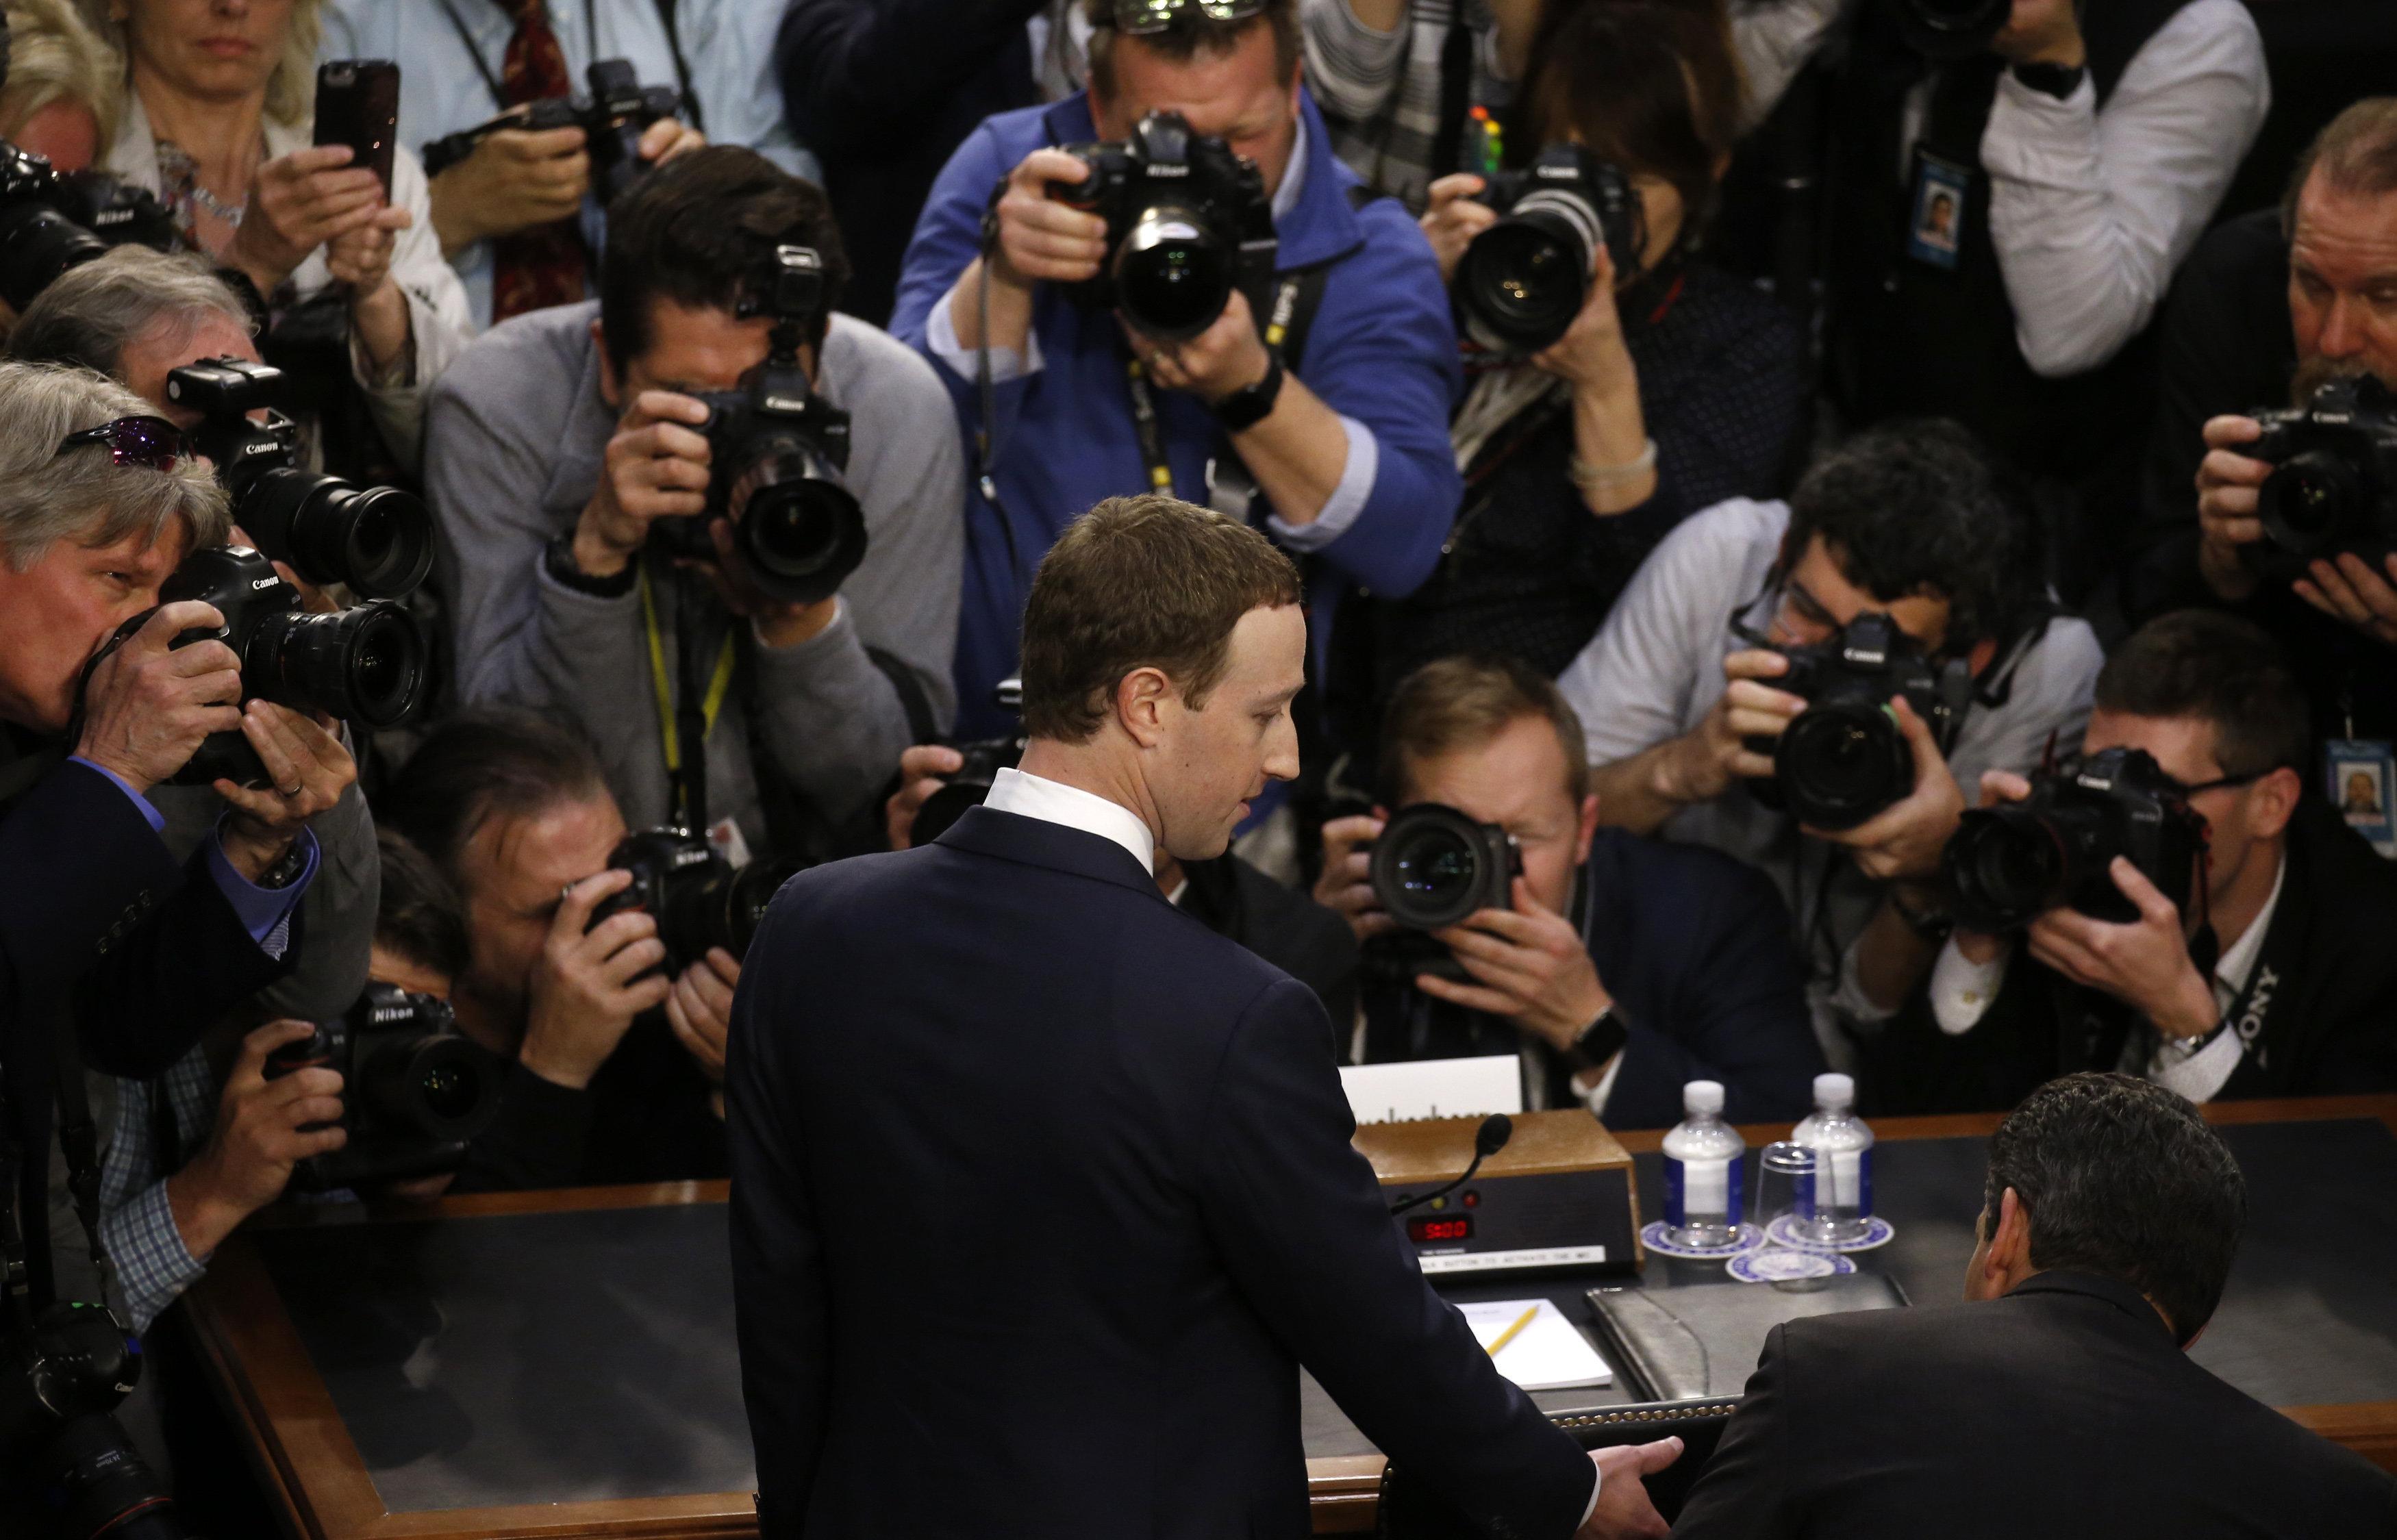 Facebook chief Mark Zuckerberg admits responsibility for data misuse